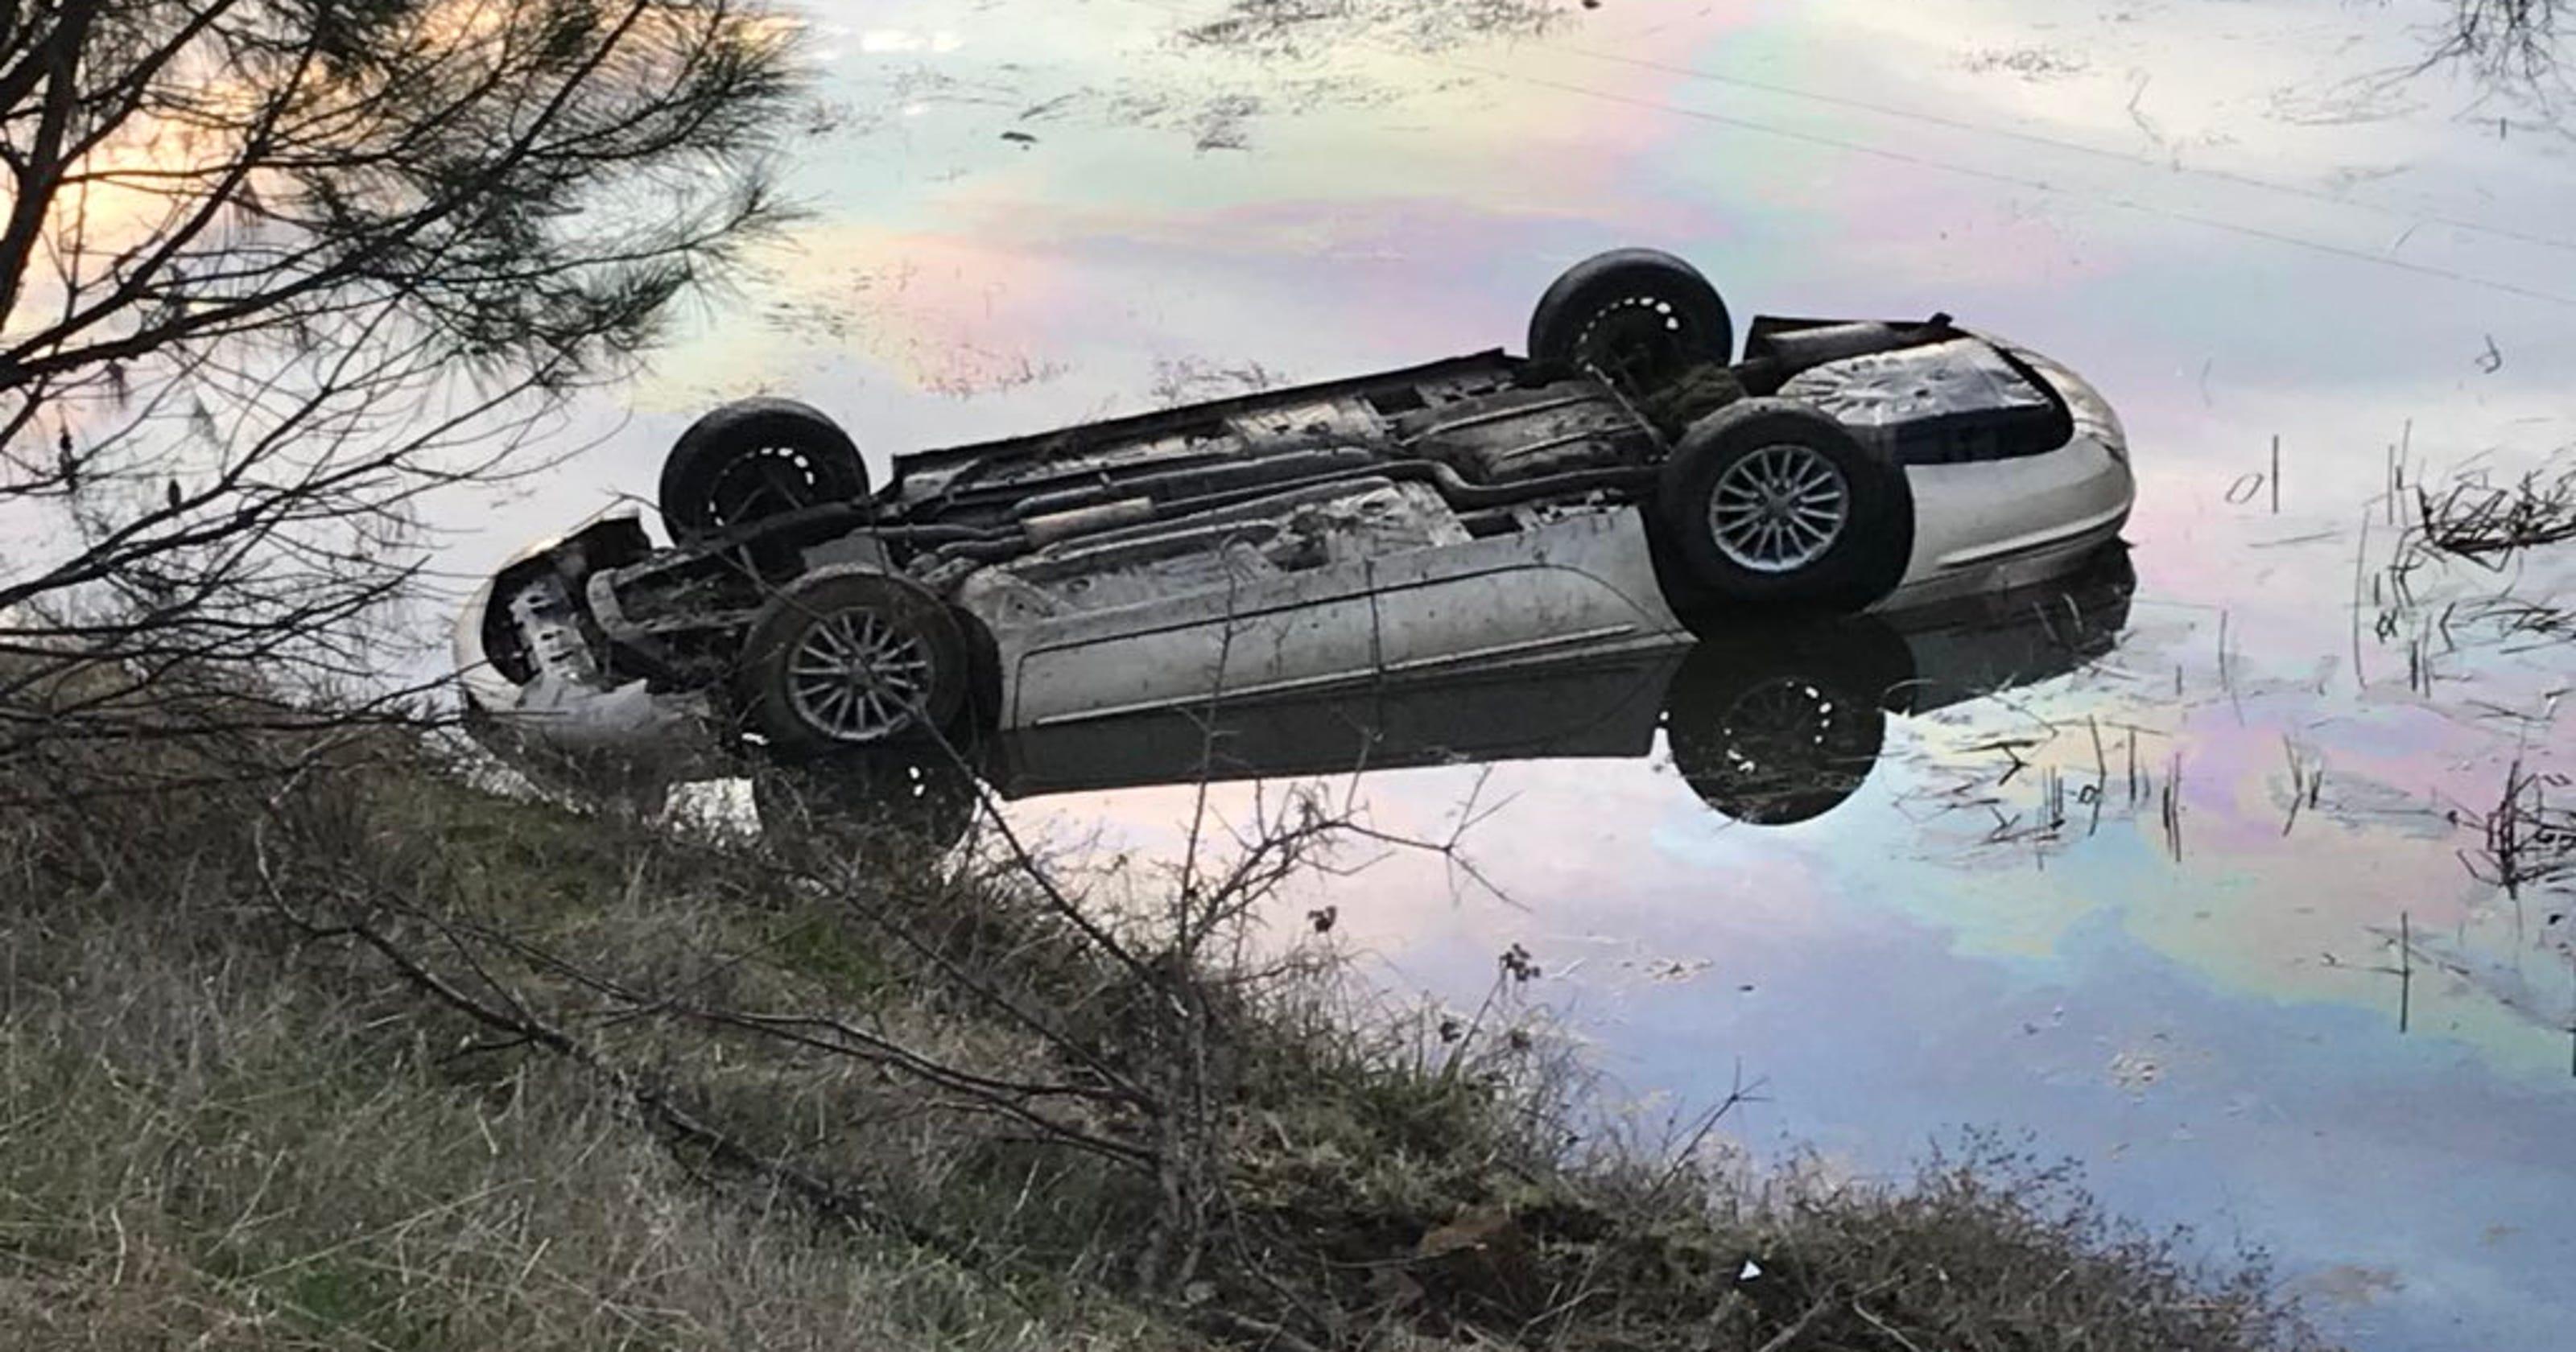 man found dead in car upside down in pond. Black Bedroom Furniture Sets. Home Design Ideas